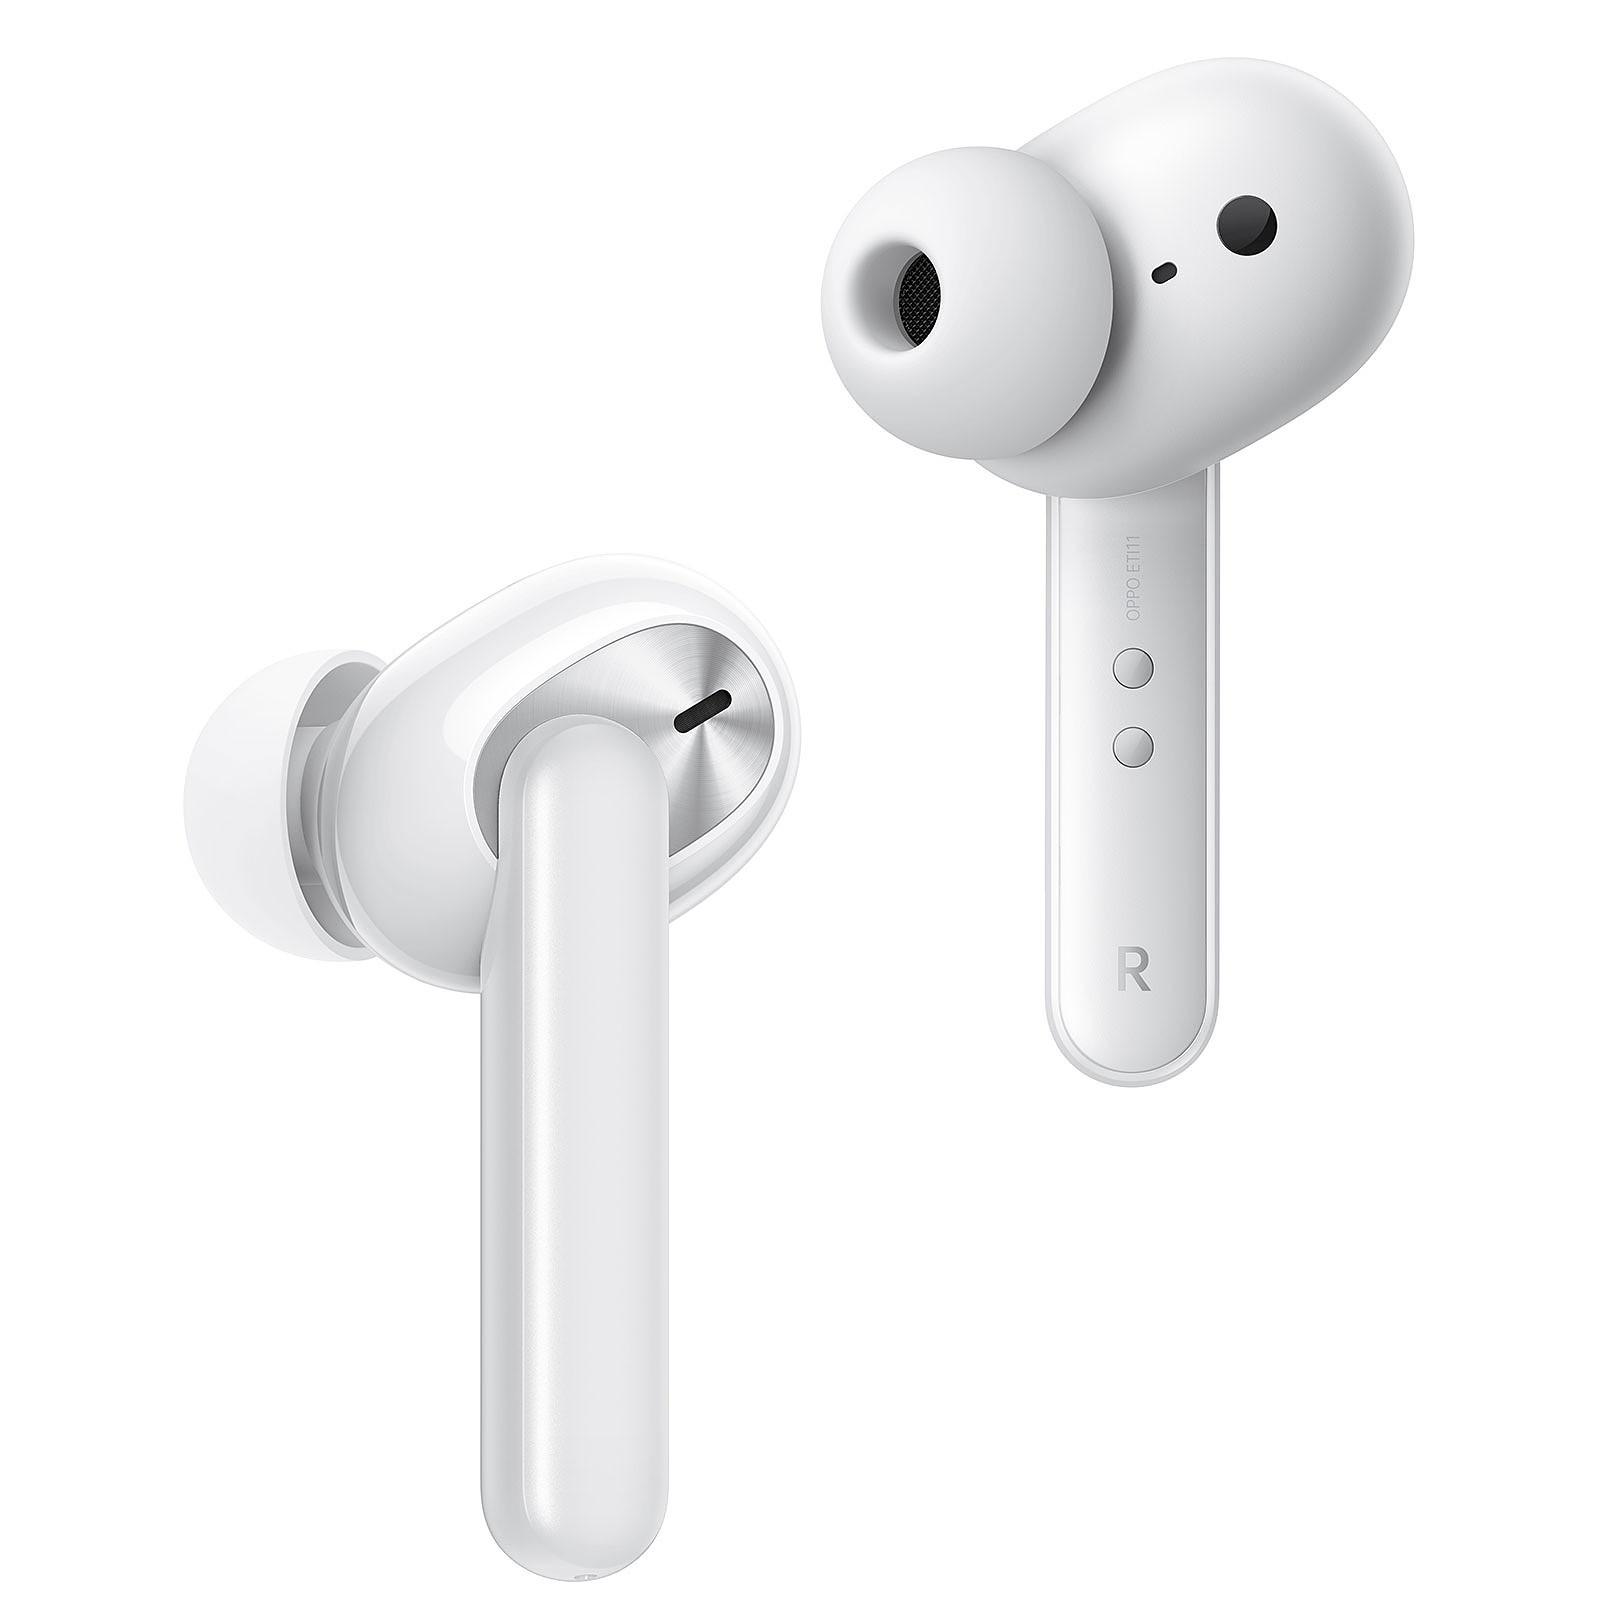 Enco W31 - Ecouteur Bluetooth - Blanc